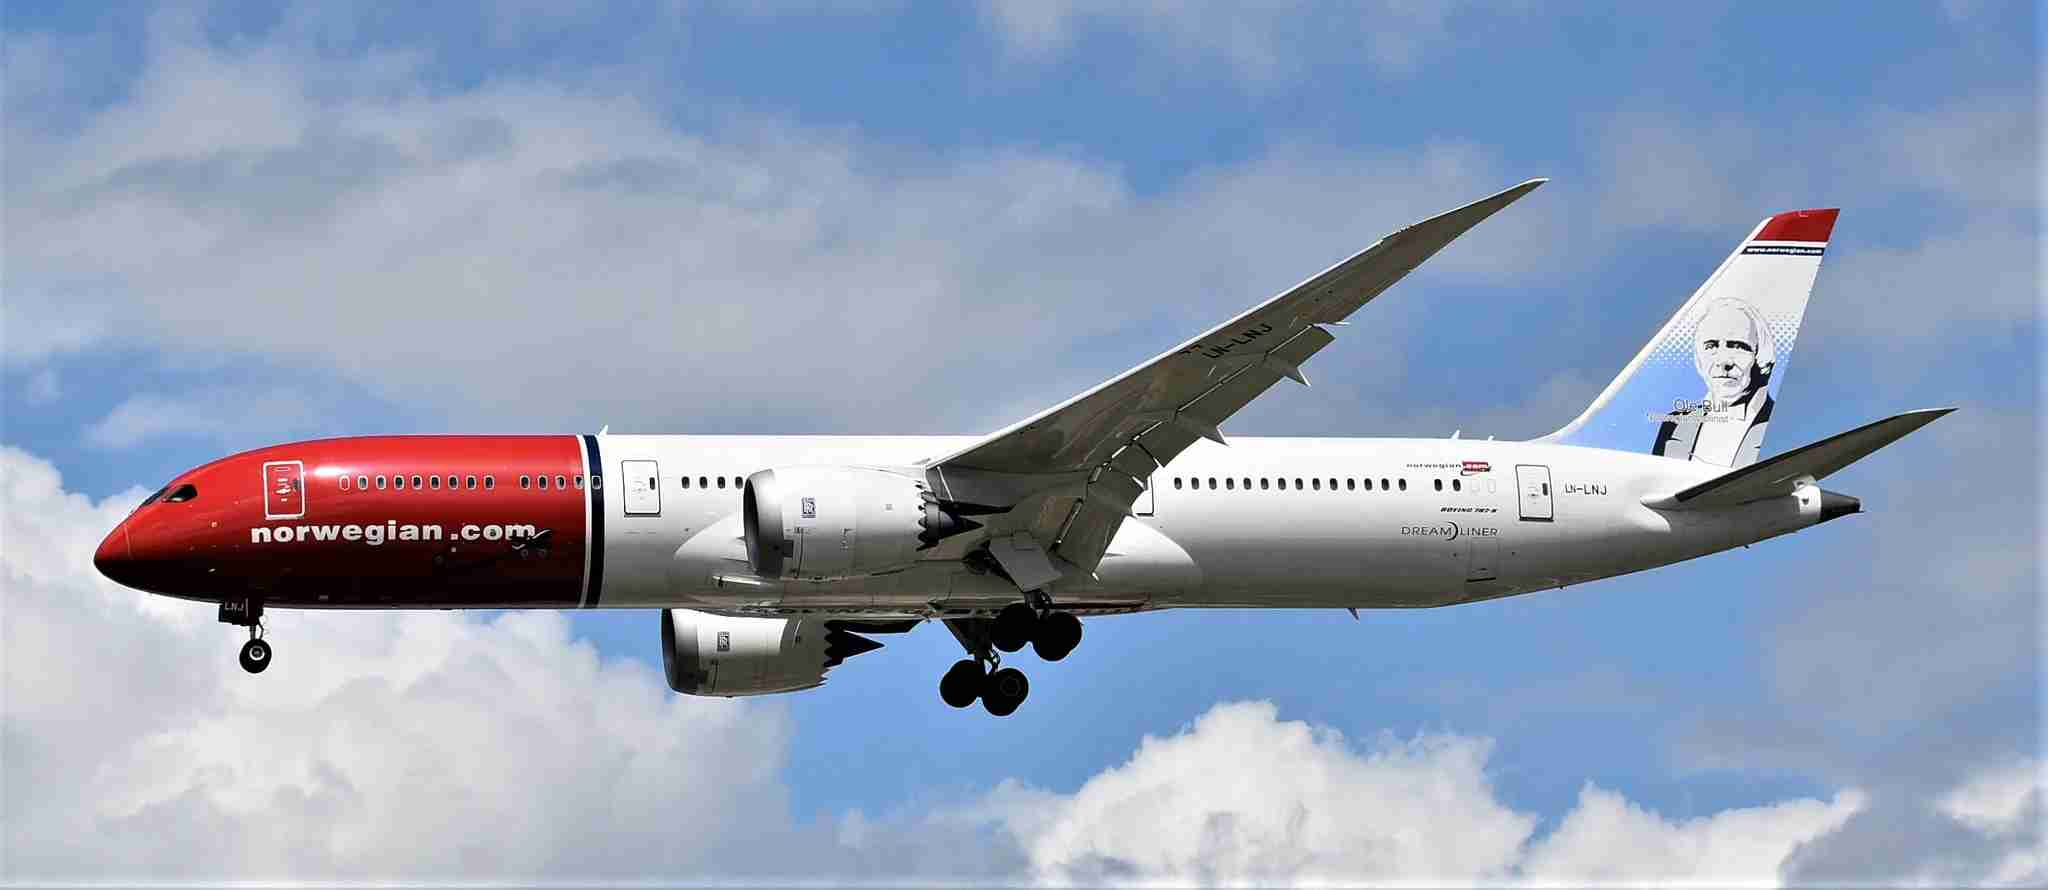 Norwegian 787-9. Photo by Alec Wilson/Flickr.